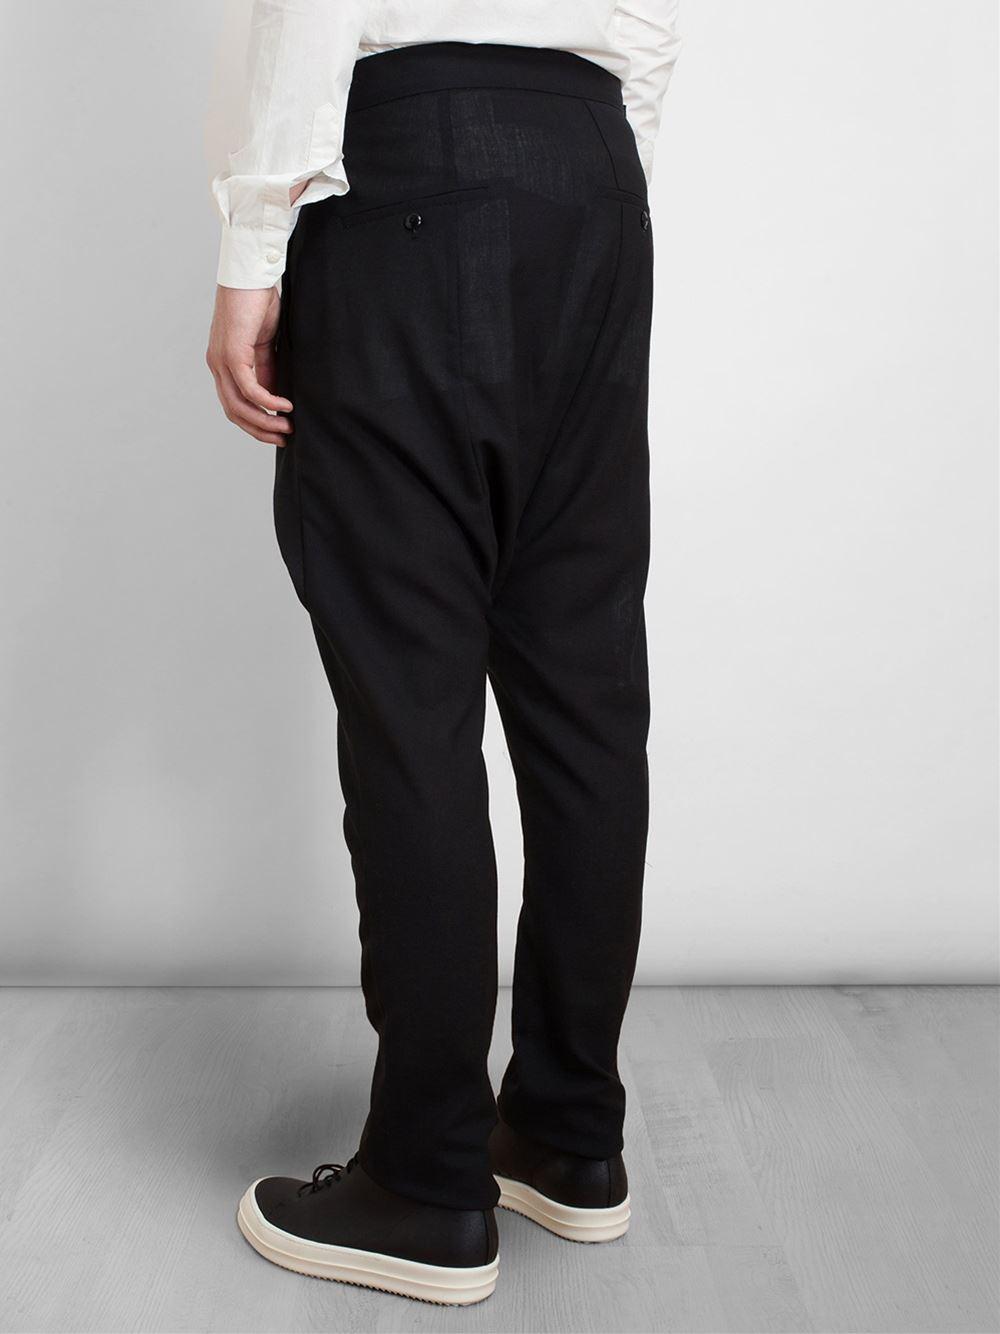 Drop Crotch Wrap Pants 3